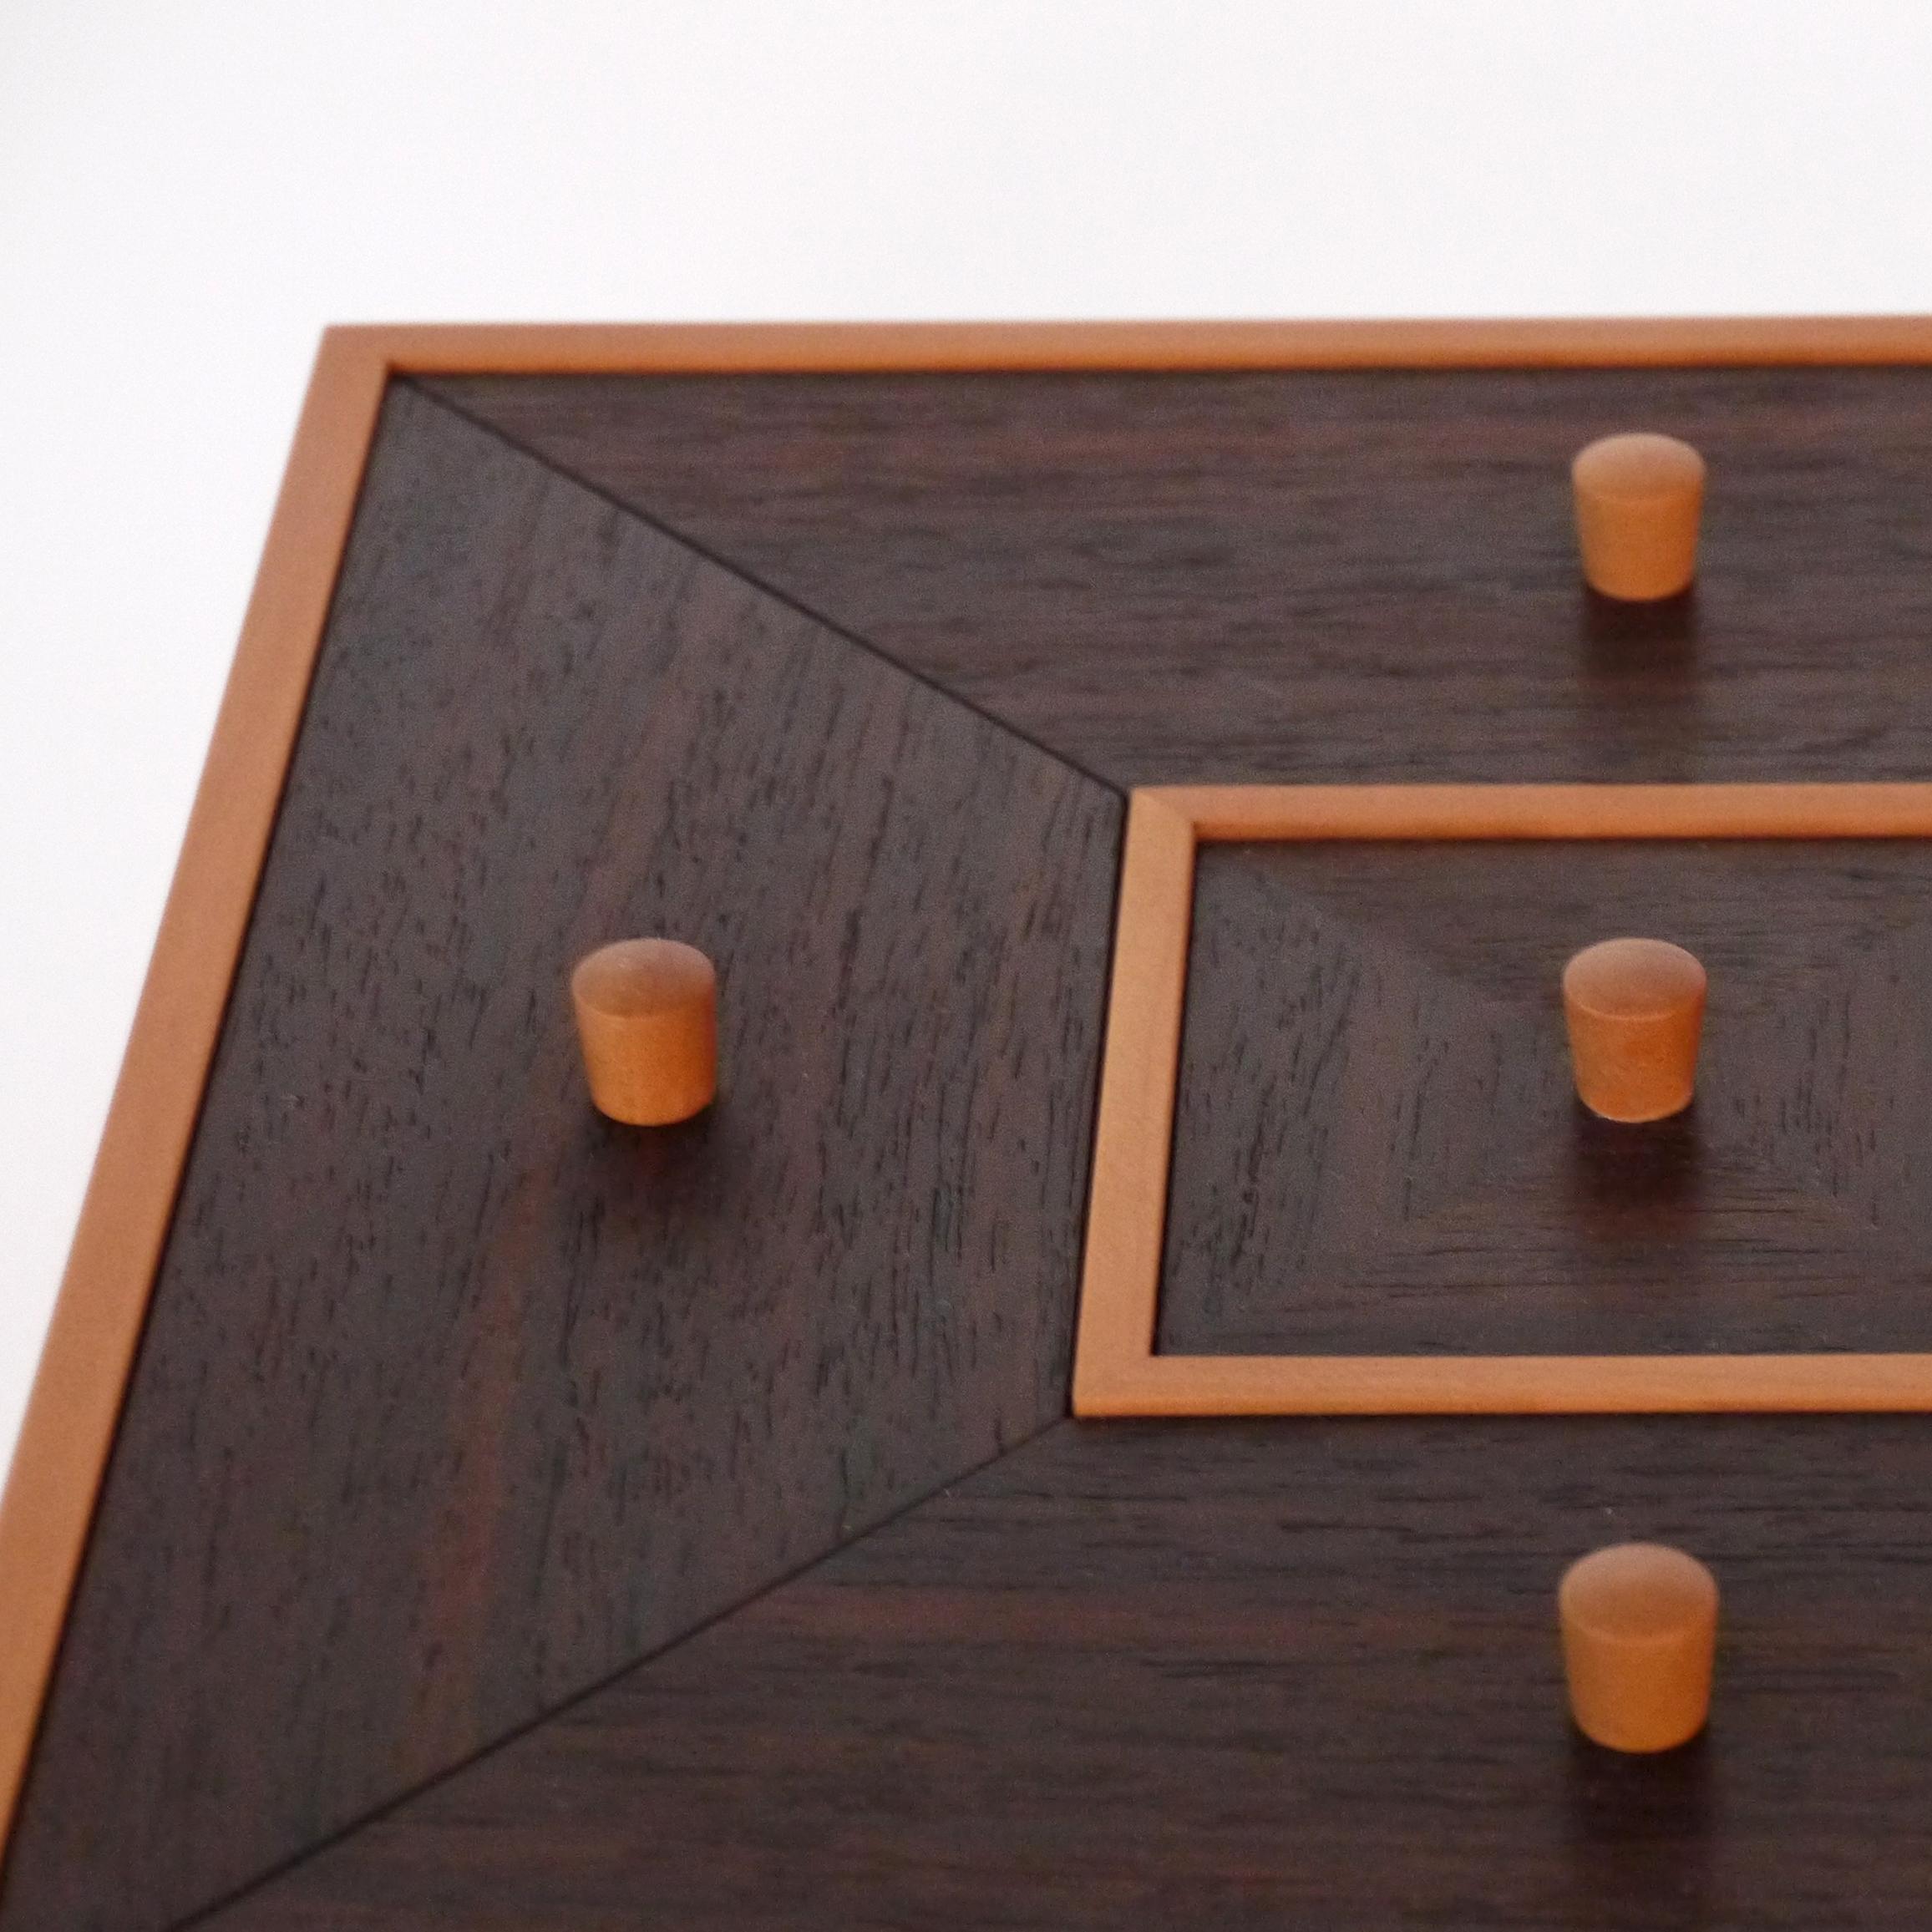 Commission - Jewelry box